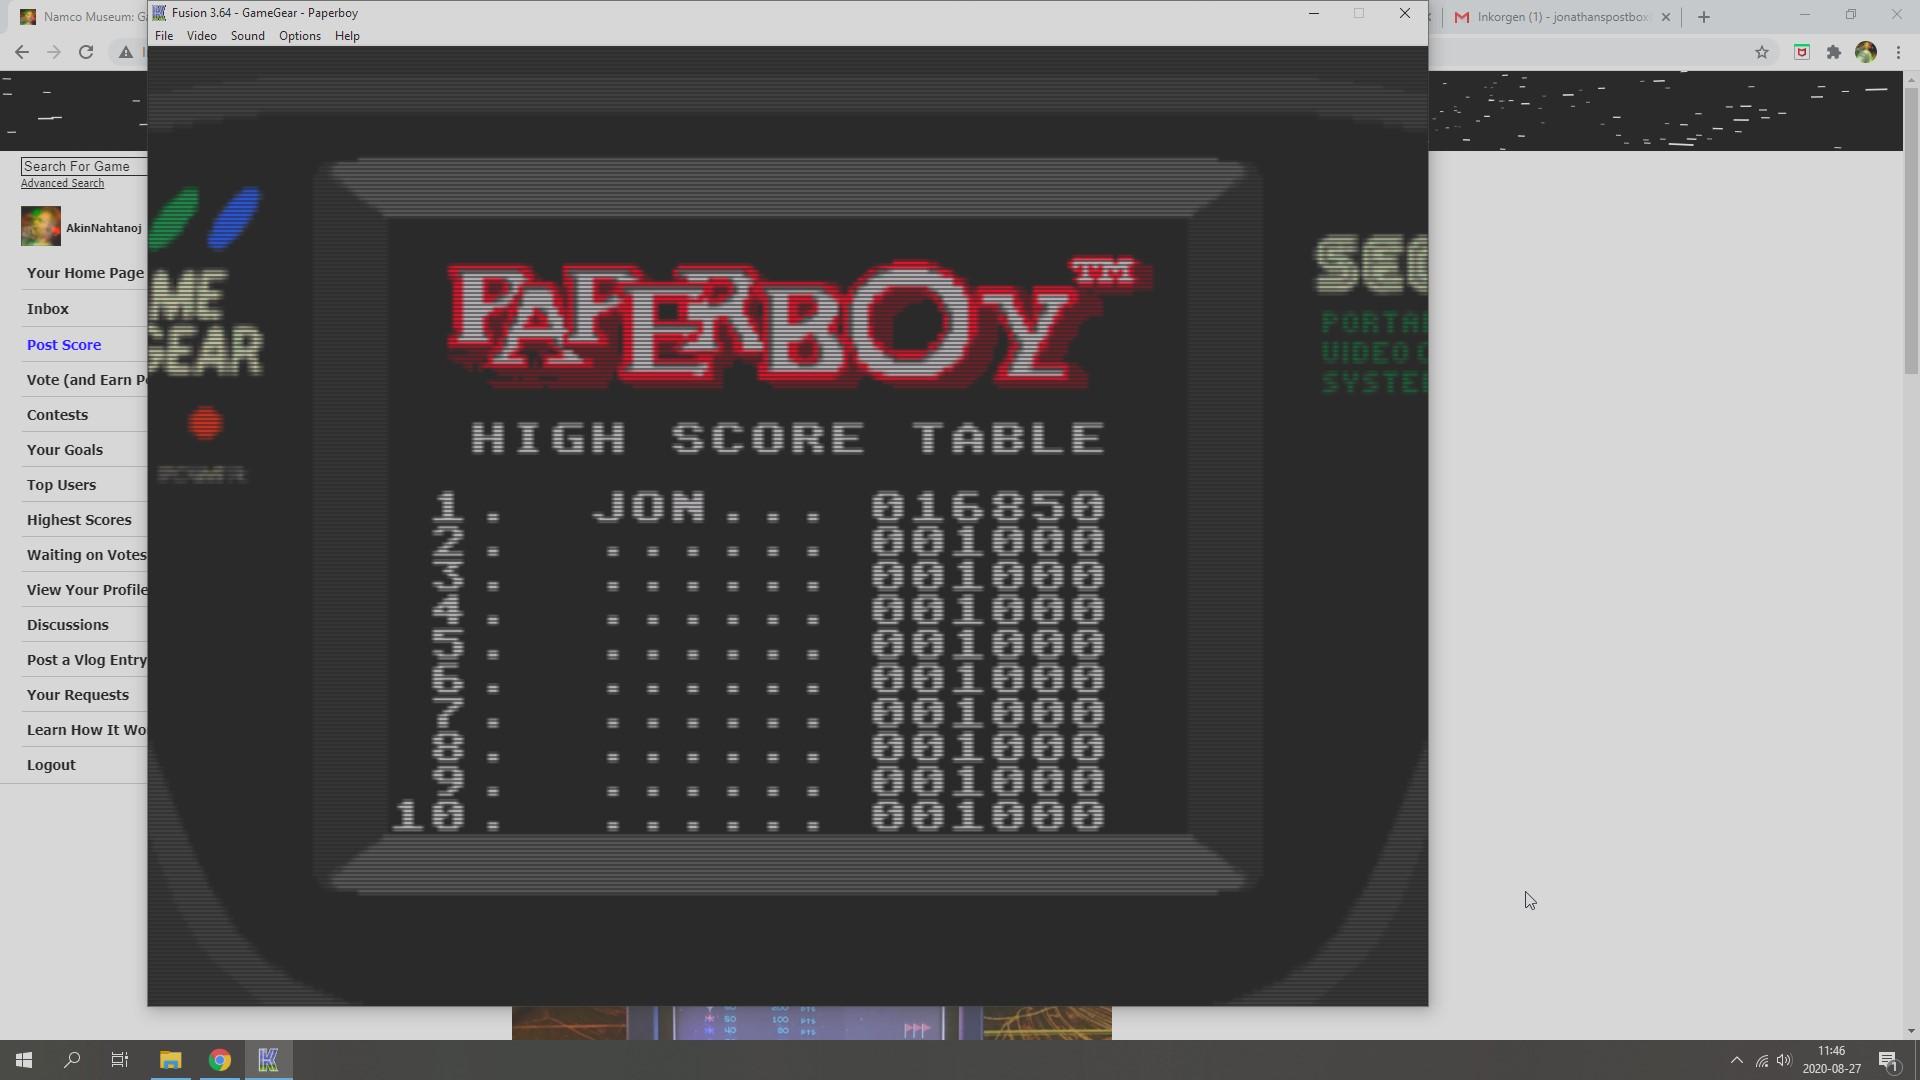 AkinNahtanoj: Paperboy [Hard Way] (Sega Game Gear Emulated) 16,850 points on 2020-08-27 05:00:55